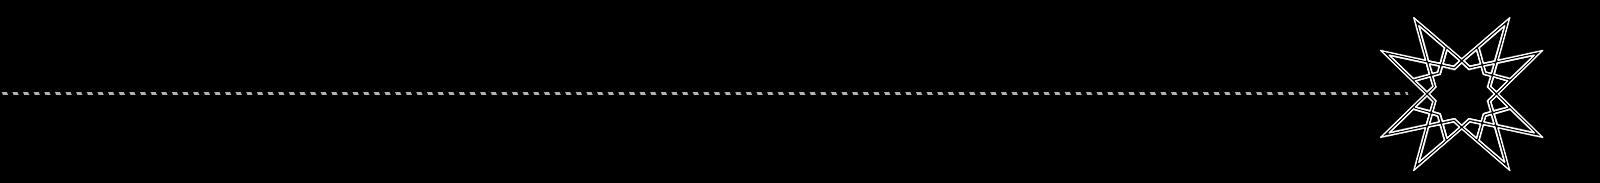 parametric 1-2 copy.jpg